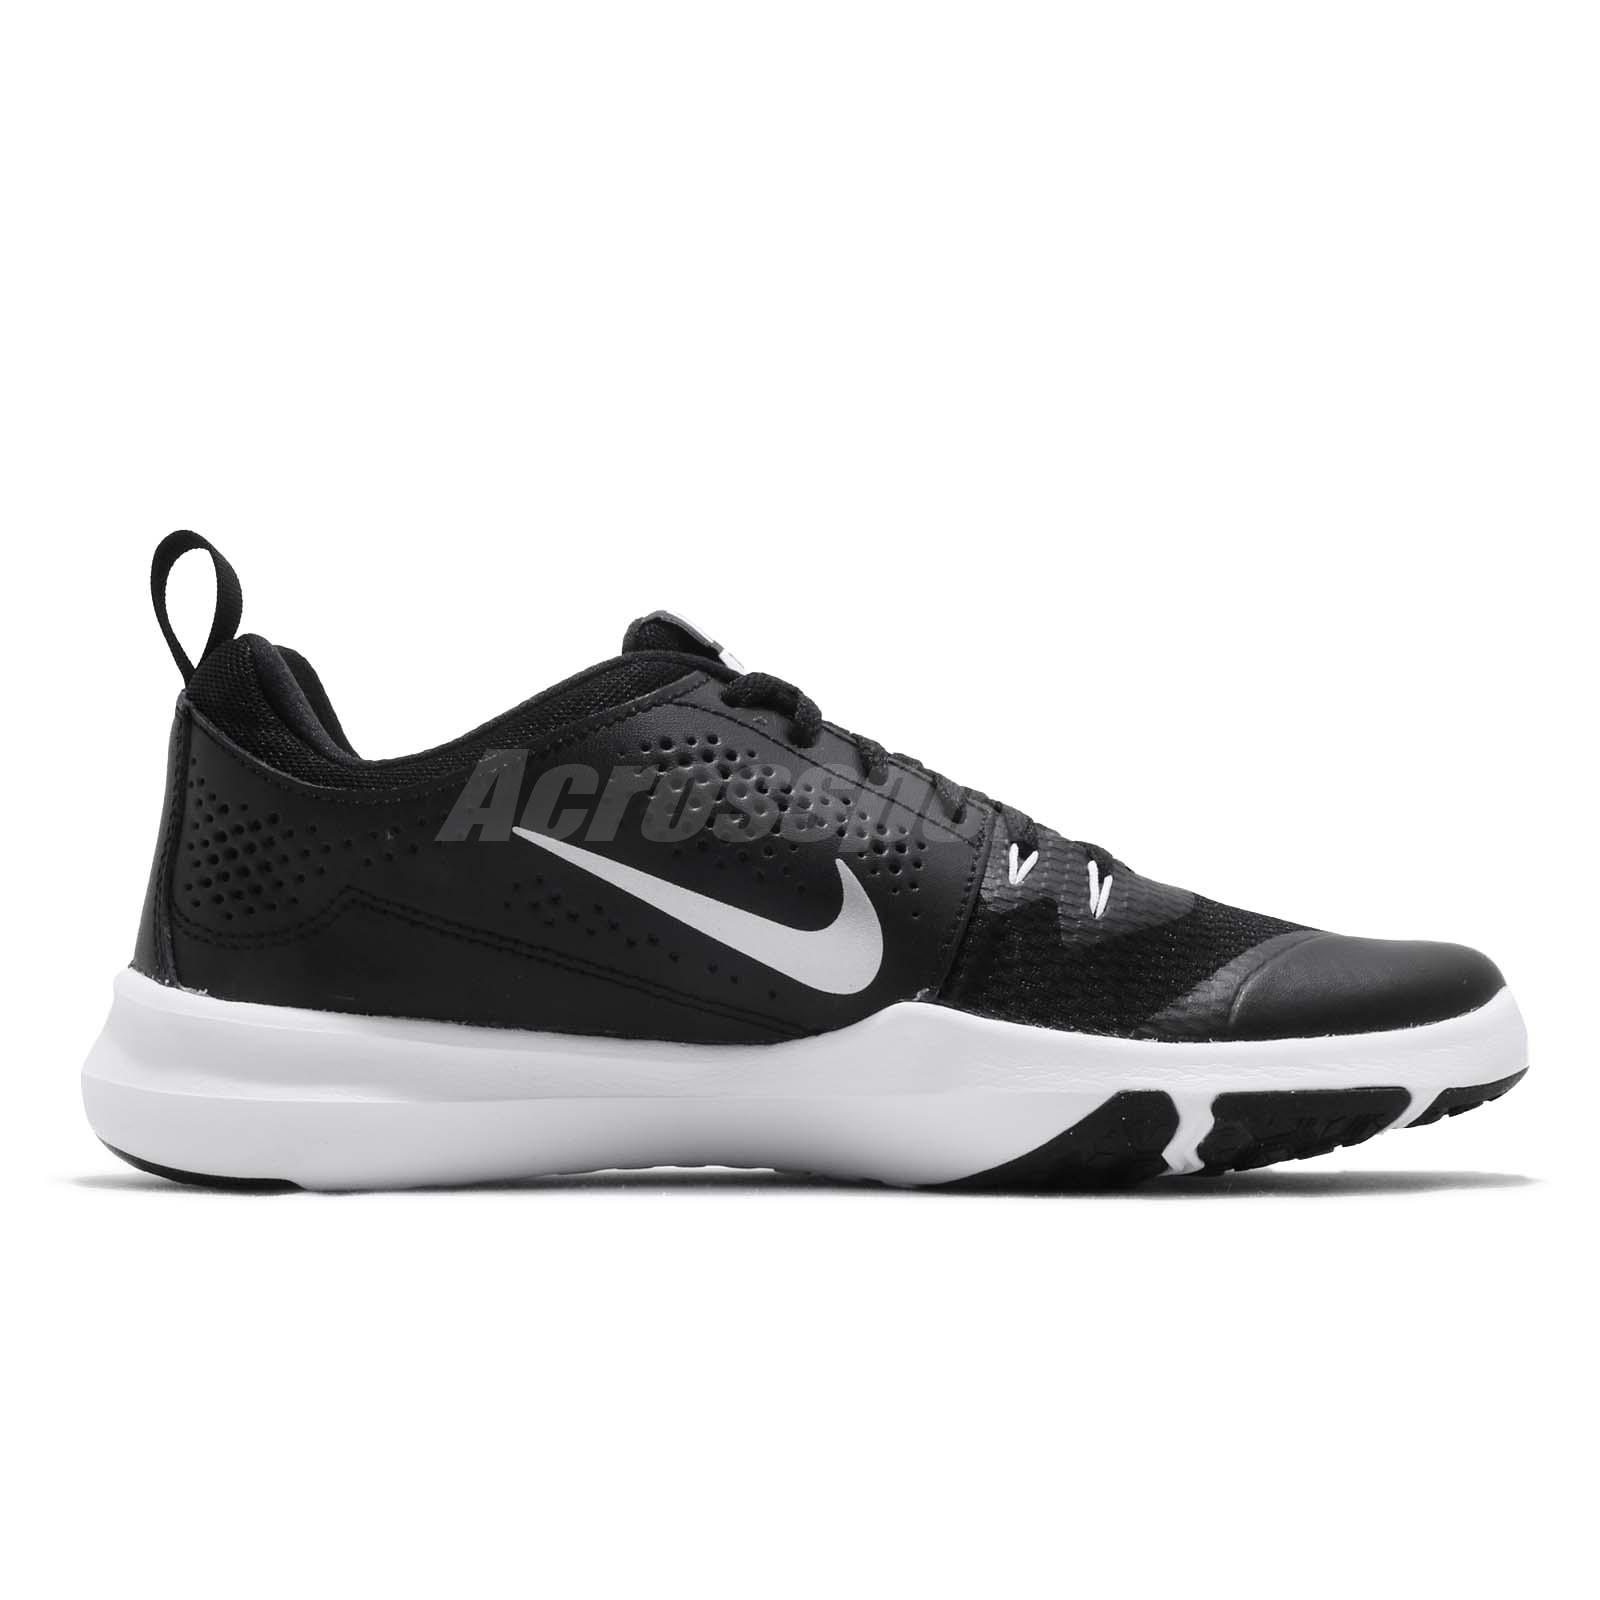 673b4e0d741 Nike Legend Trainer Black Silver White Men Cross Training Shoes ...